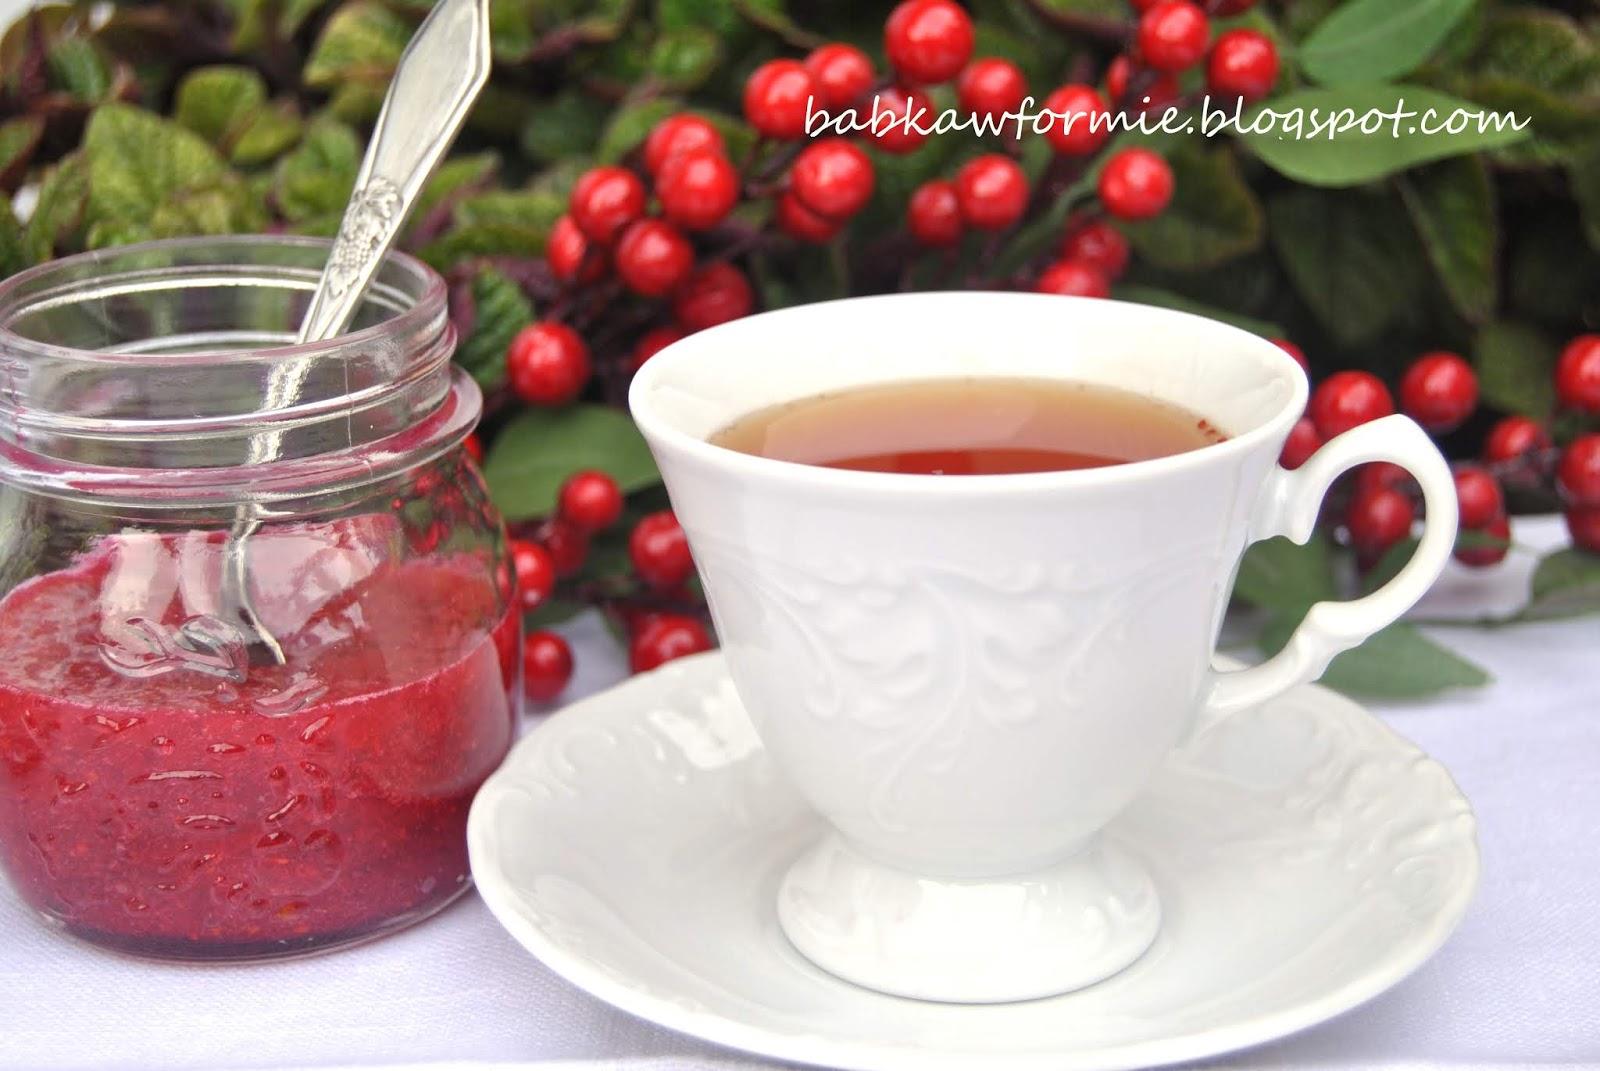 przetwory na zimę - żurawina do herbaty ucierana na zimno